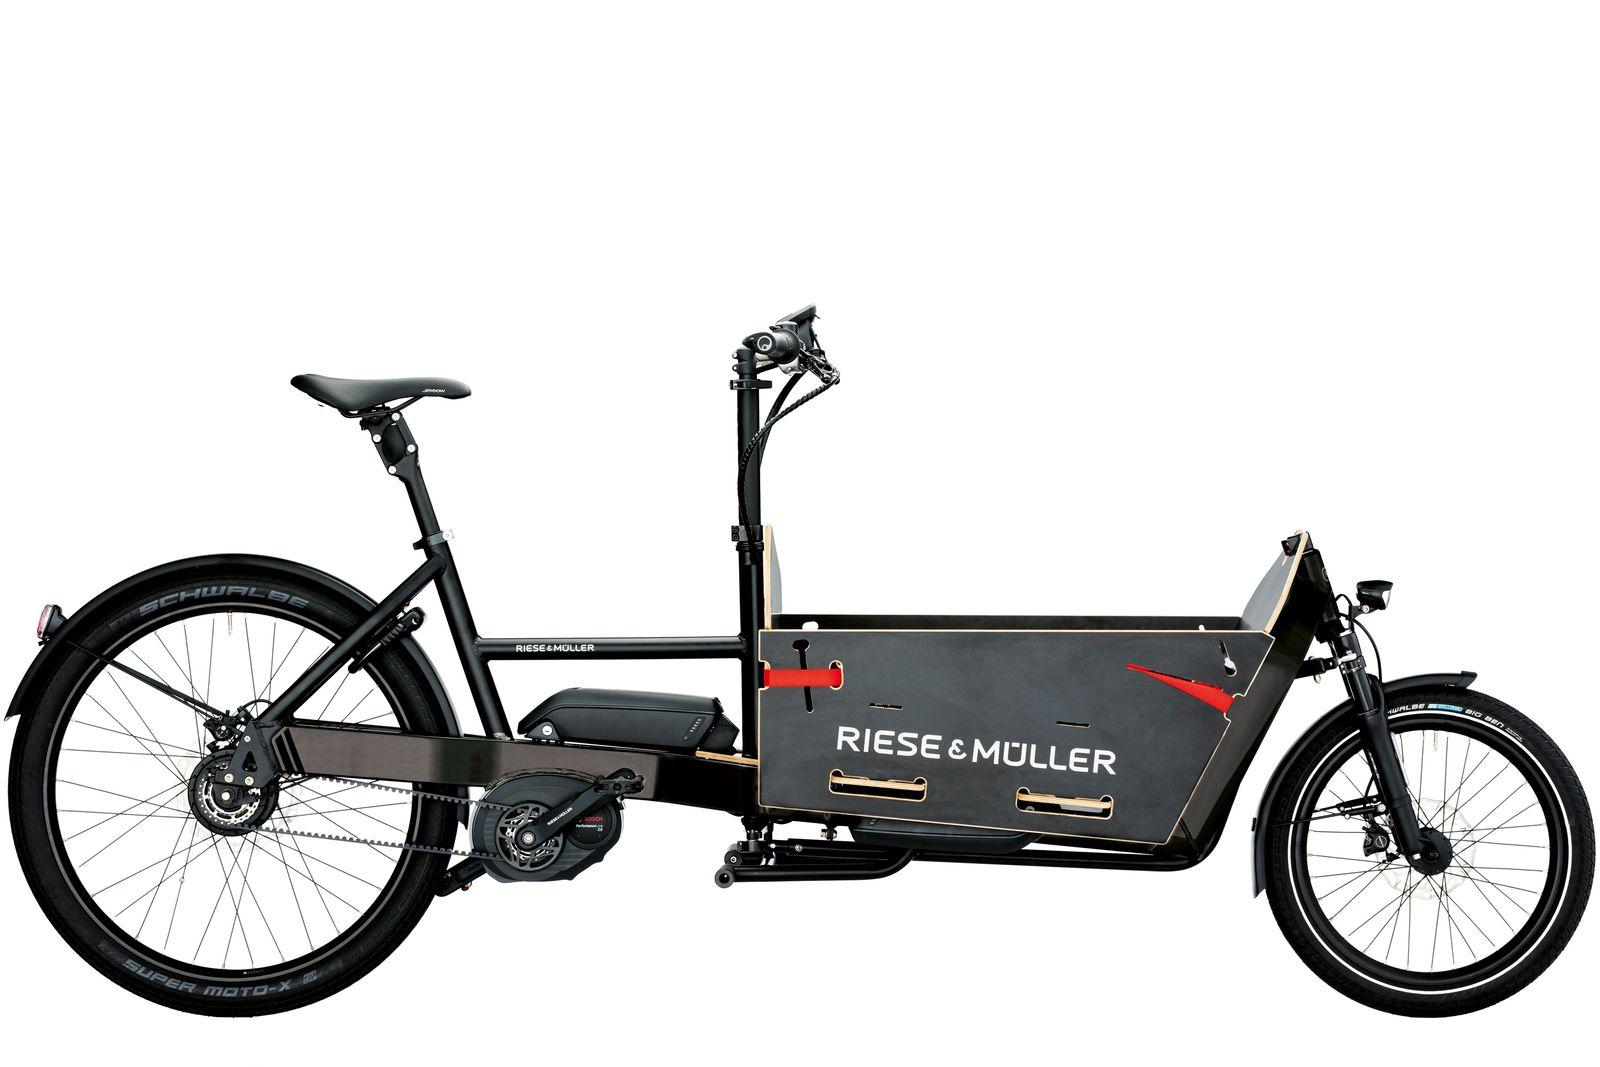 EINMALIGE VERWENDUNG EURO Bike